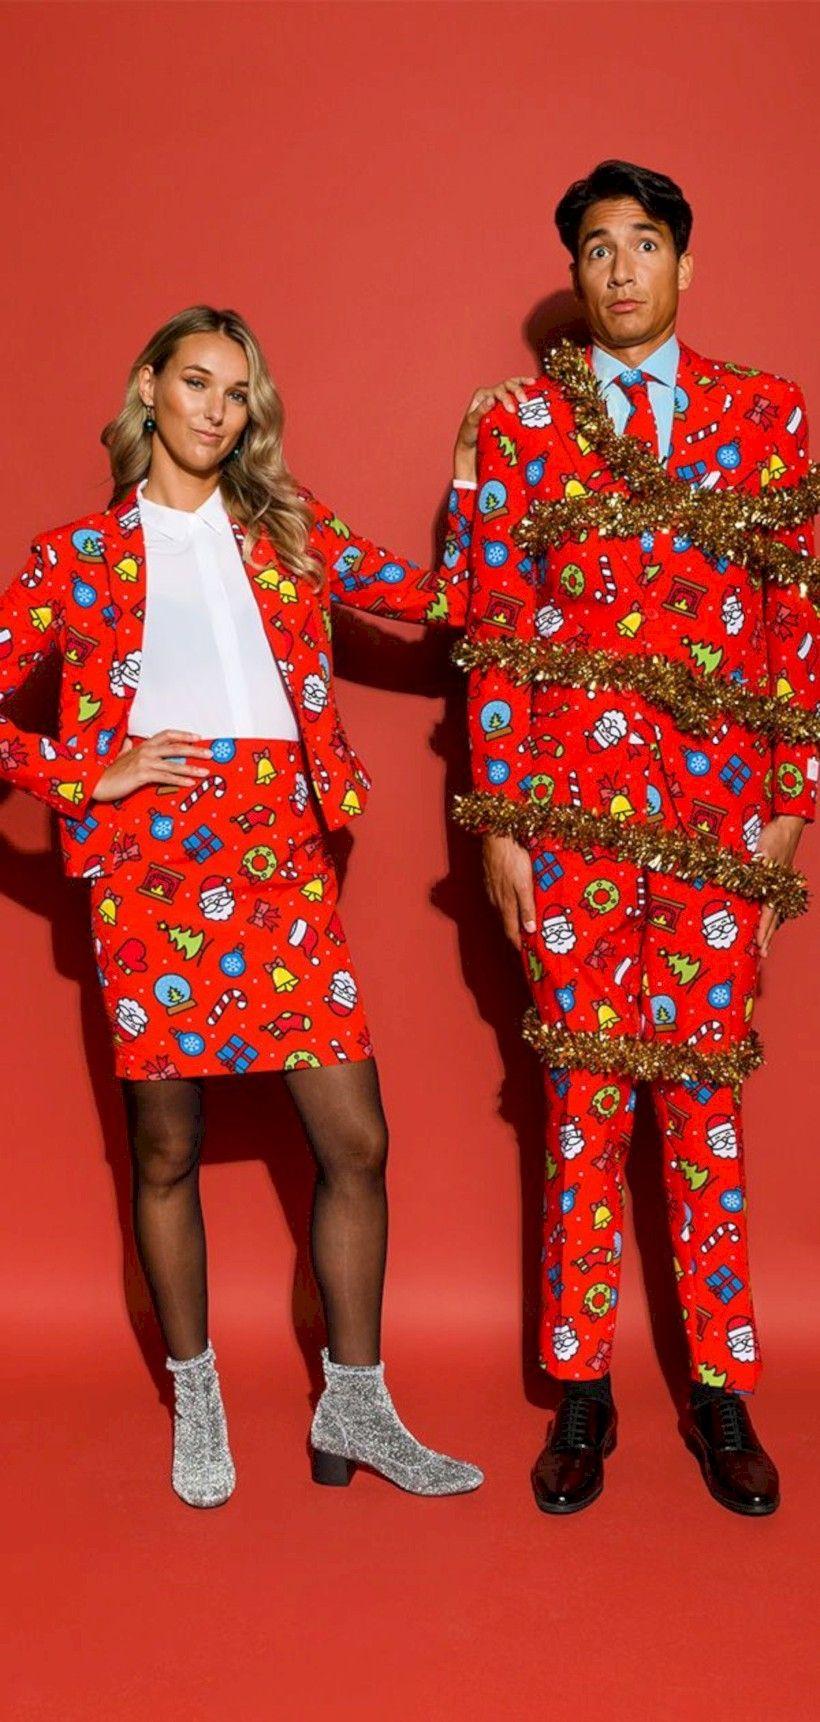 Fashion Style Men & Women Matching